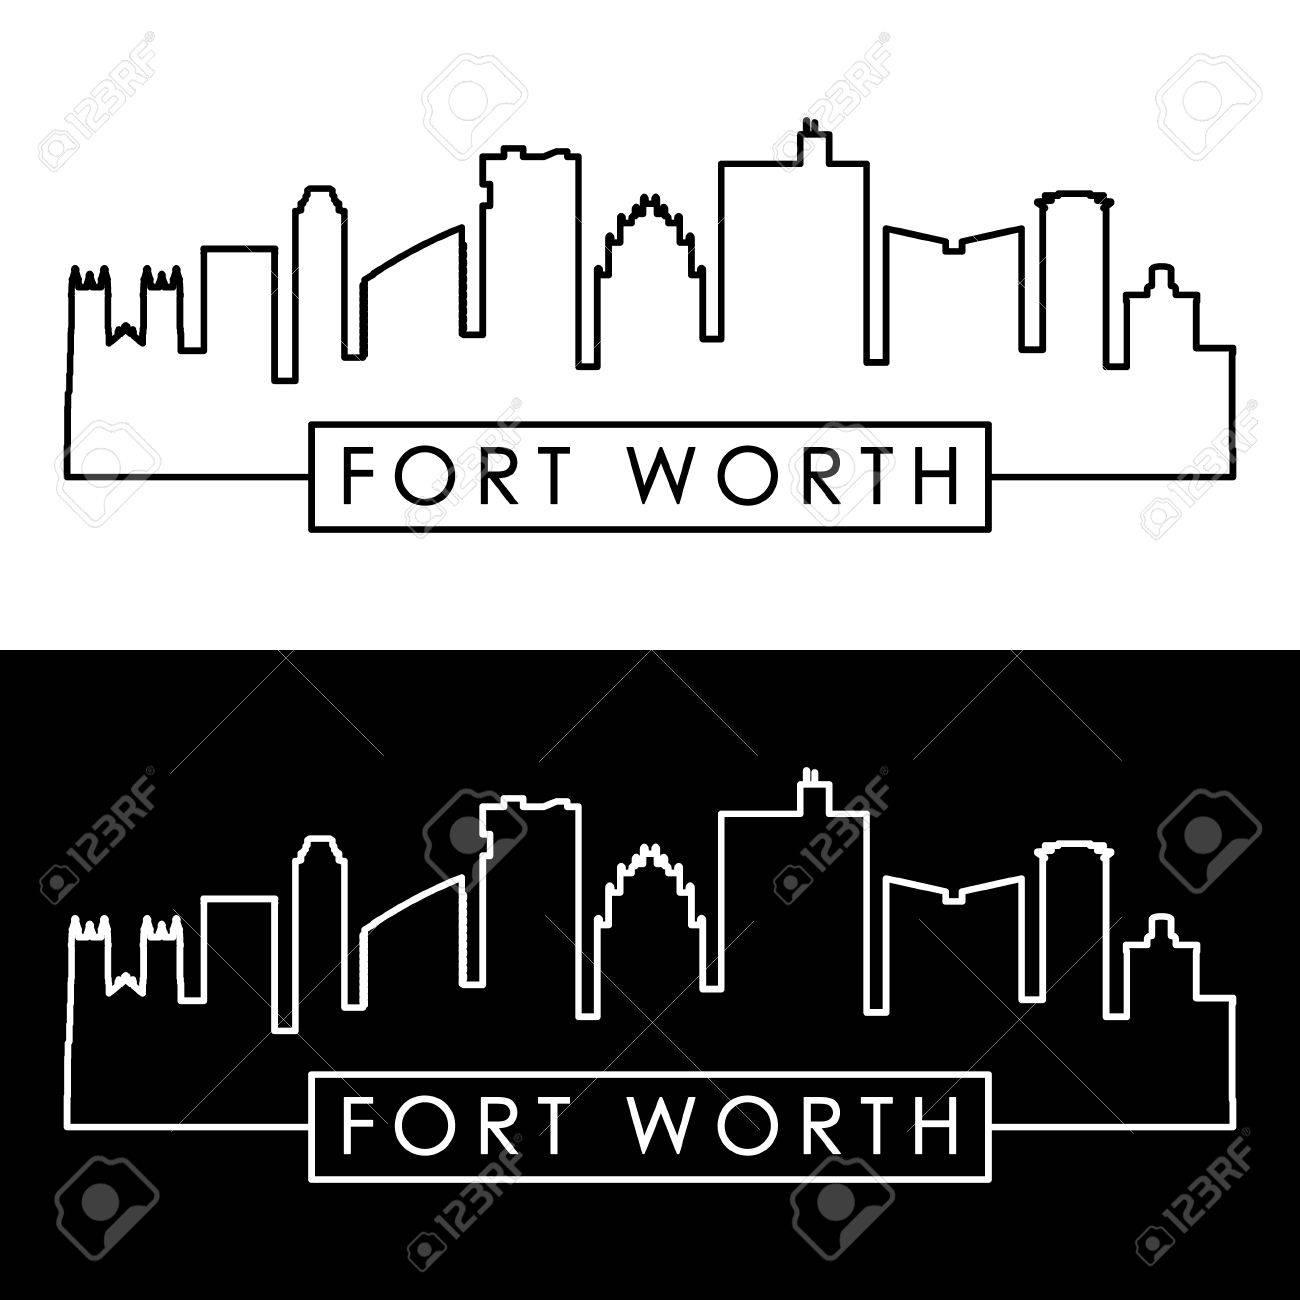 Fort Worth skyline. Linear style. Editable vector file. - 83407911